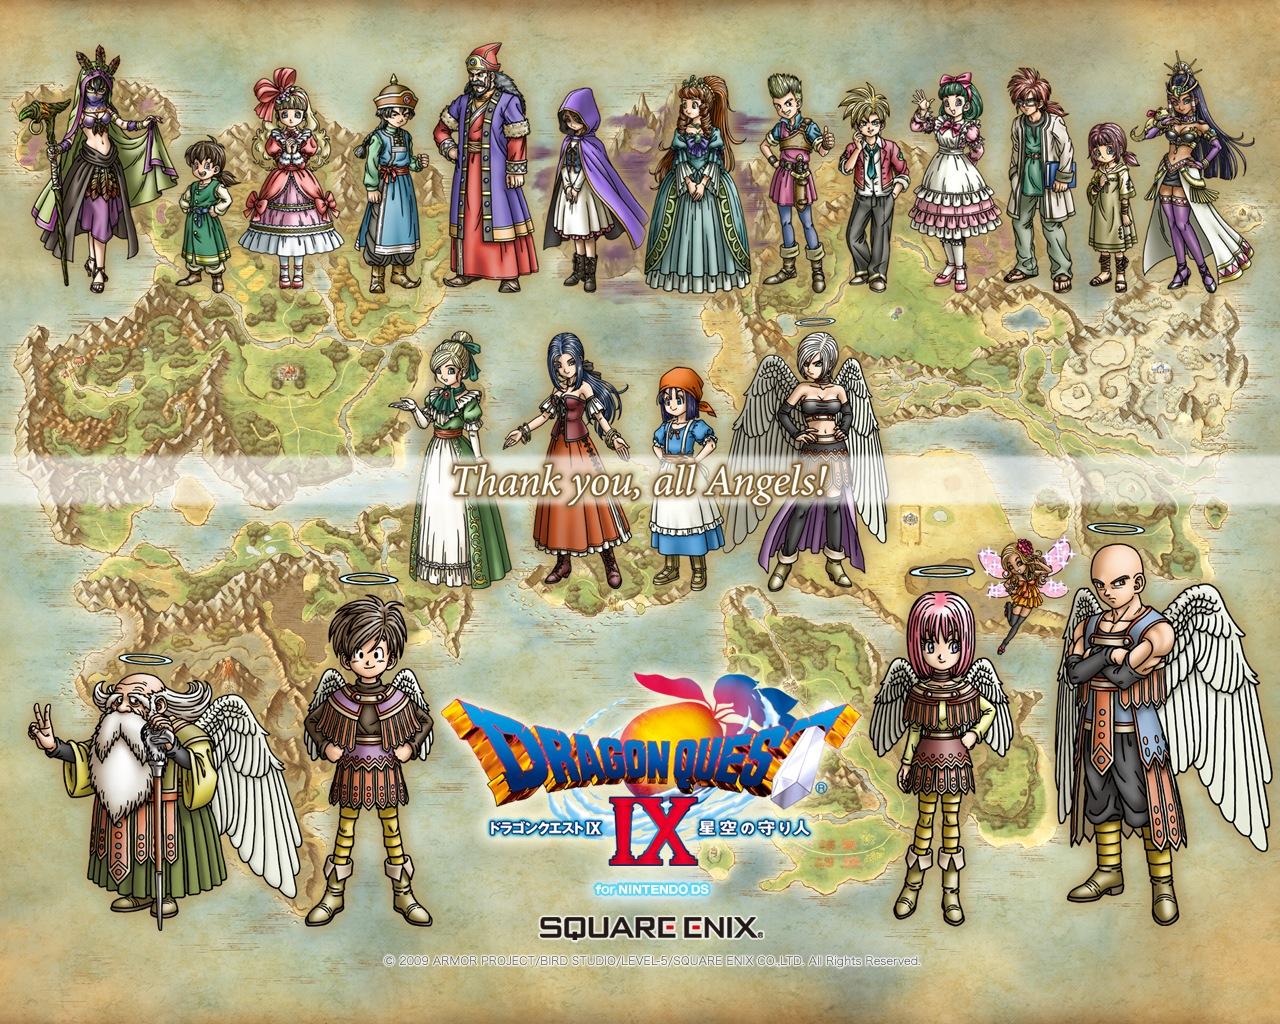 http://3.bp.blogspot.com/-o_2cdUnERDQ/UQXABF7kbGI/AAAAAAAADH8/z5ItUaFzOH8/s1600/dragon_quest_9_wallpaper3.jpeg